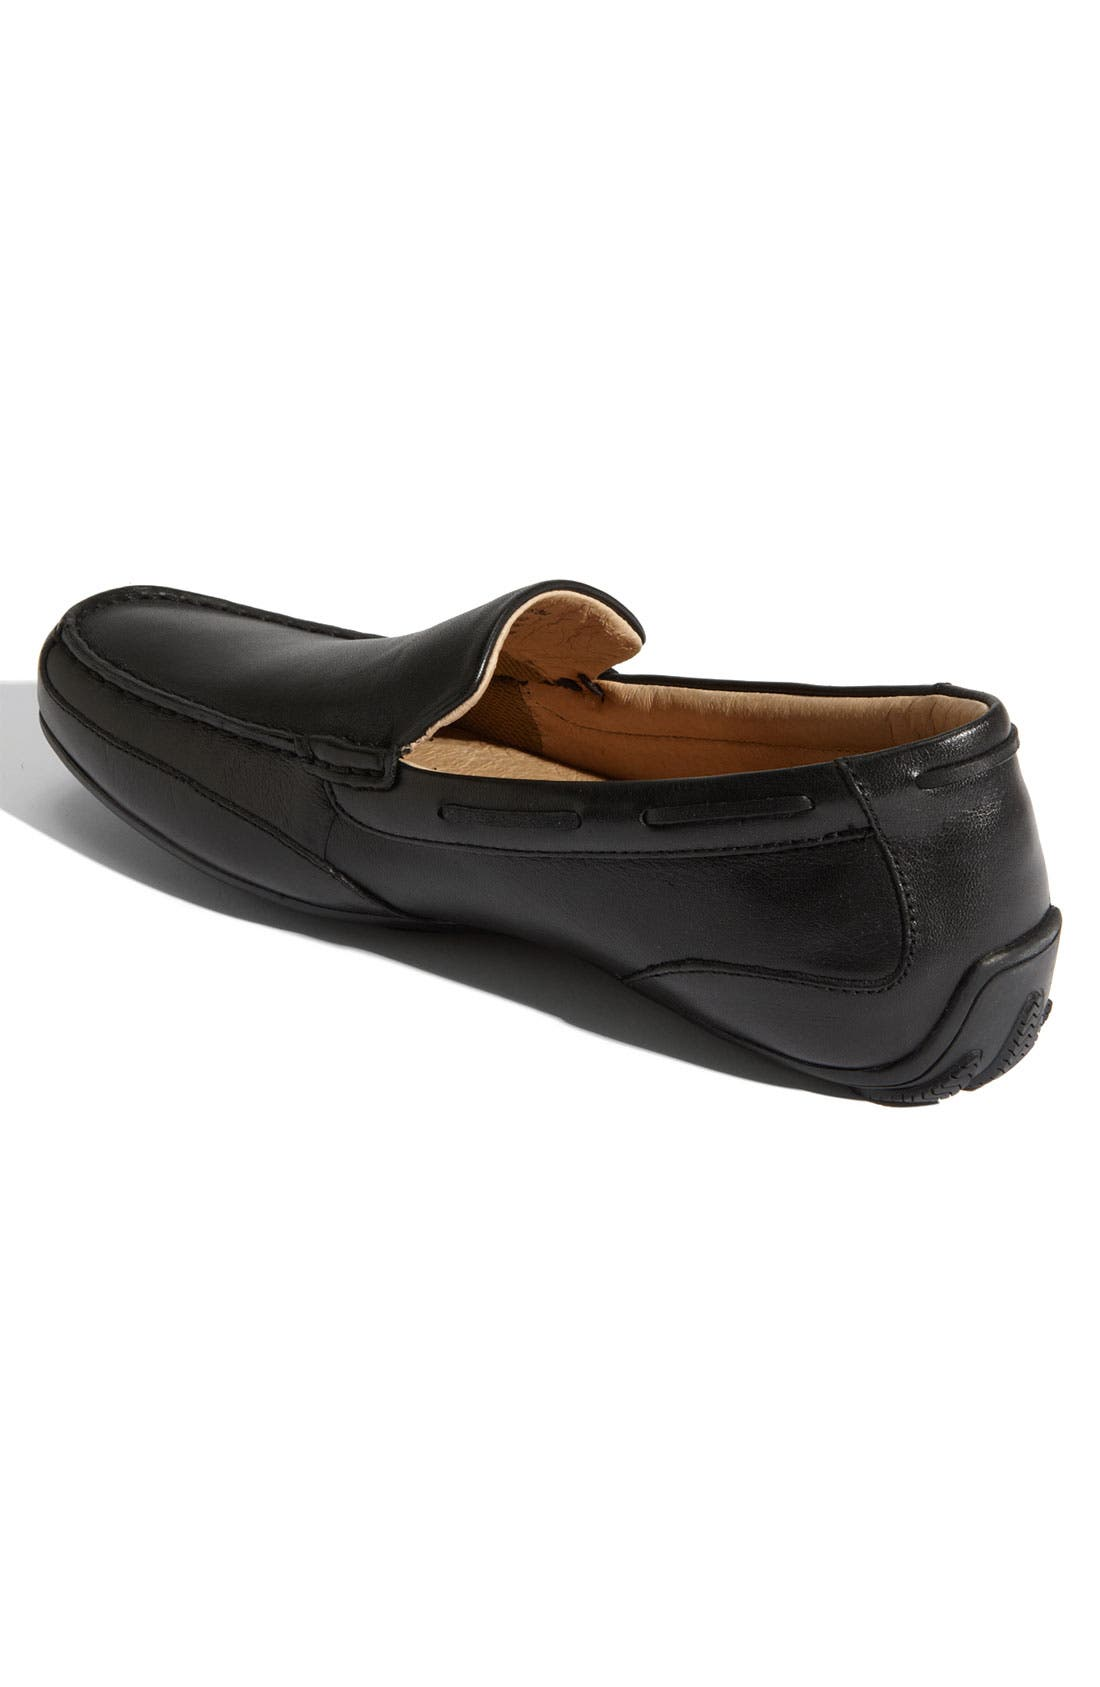 Alternate Image 2  - Sperry Top-Sider® 'Navigator Venetian' Driving Shoe